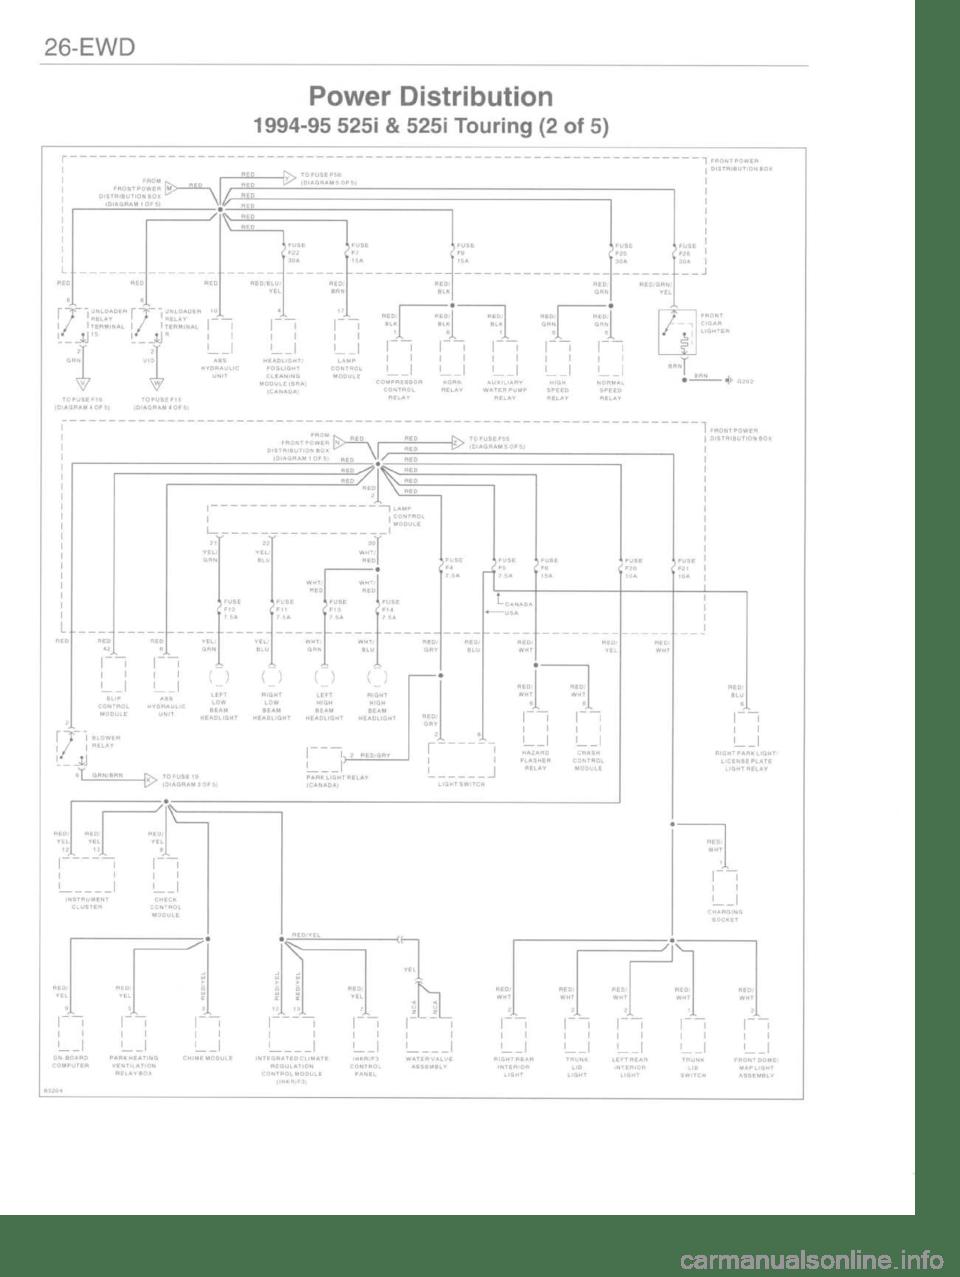 hight resolution of 1985 bmw k100 wiring diagram auto 525i fuse box location 2006 x 3 bmw 525i